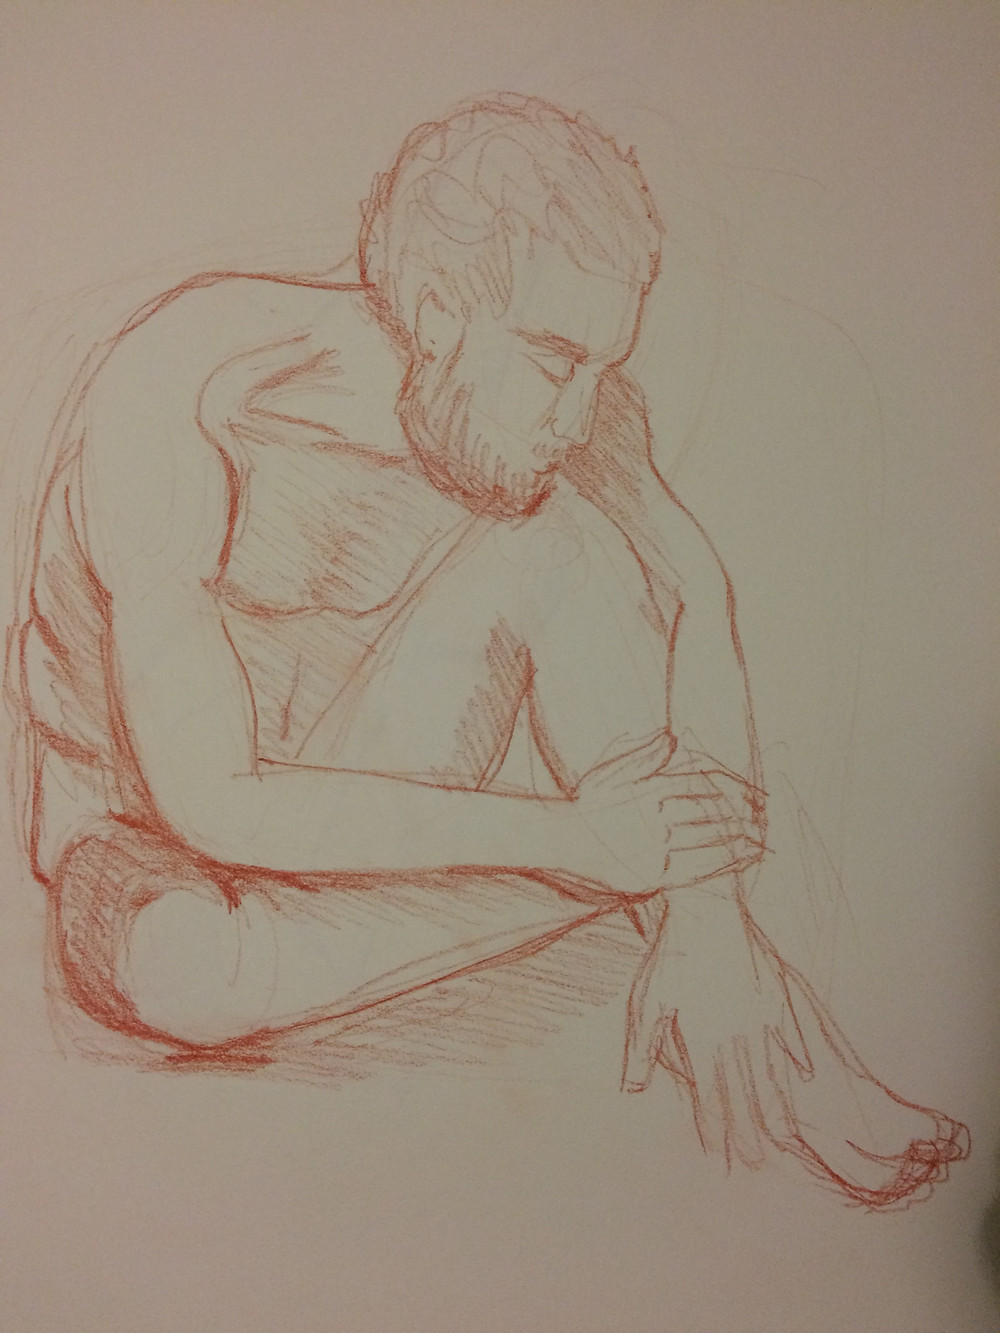 A 15min male pose drawin by Julia P Ames